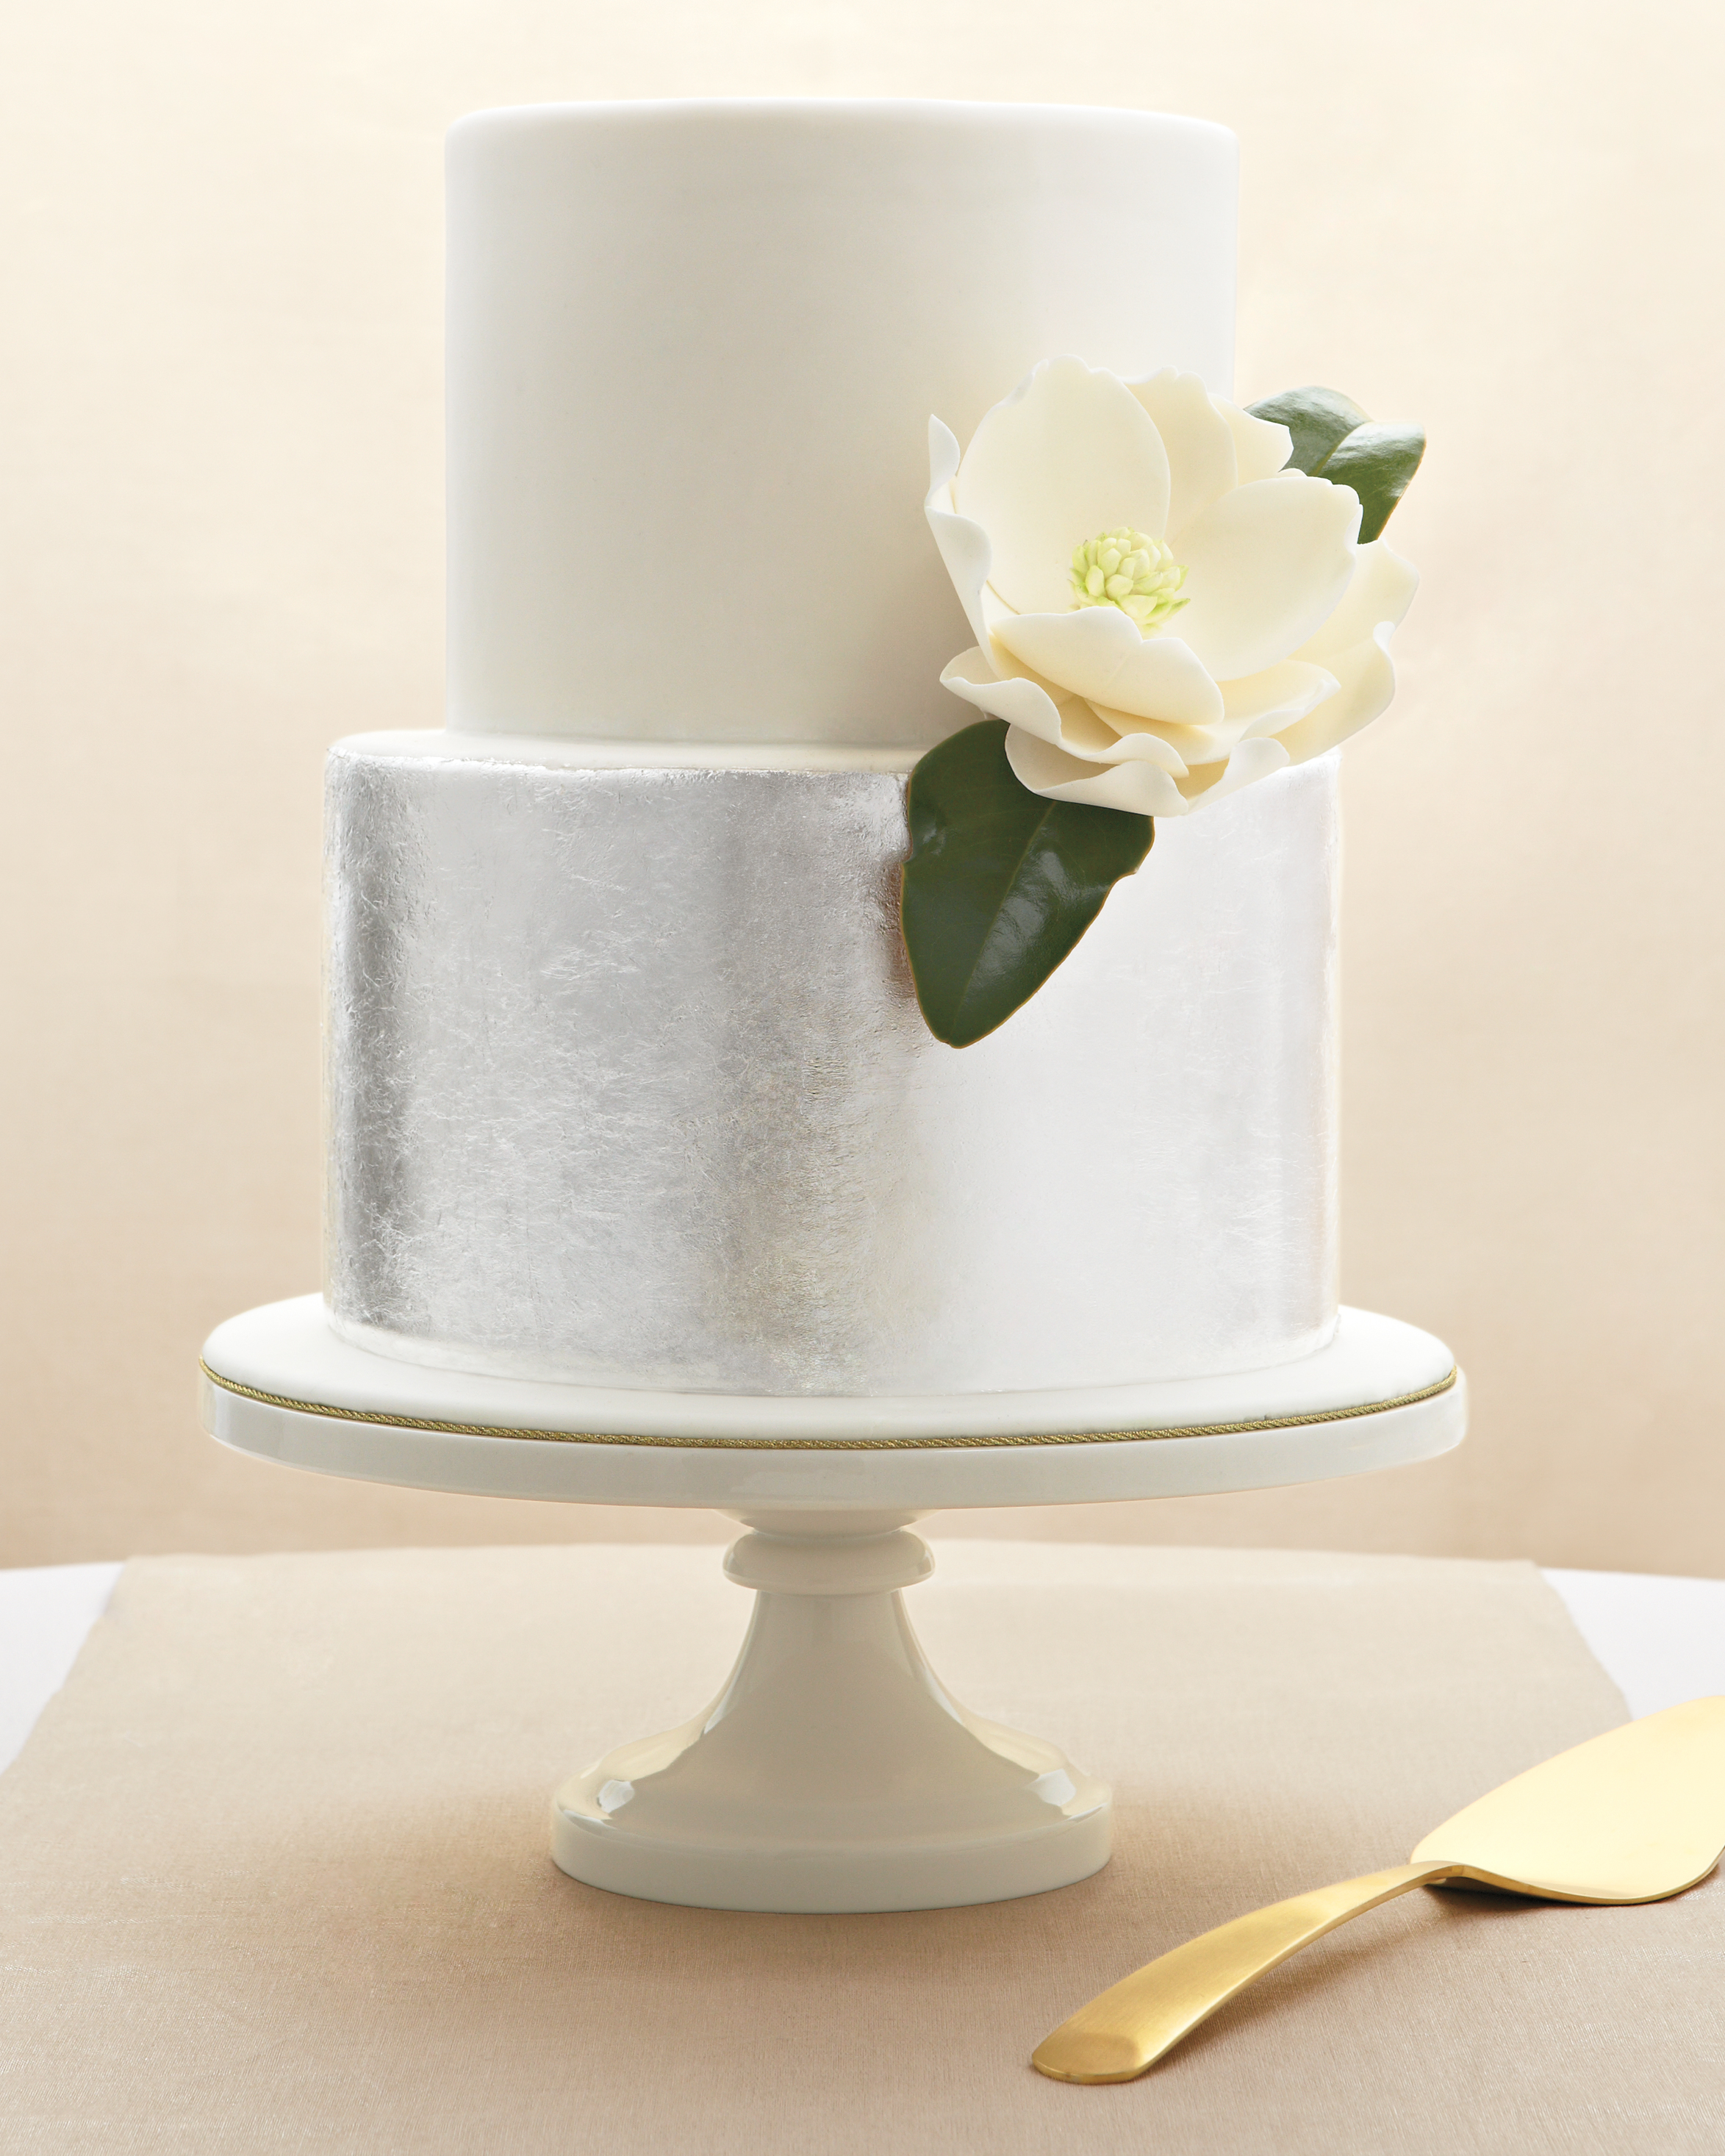 megan-david-cake-mwd109358.jpg